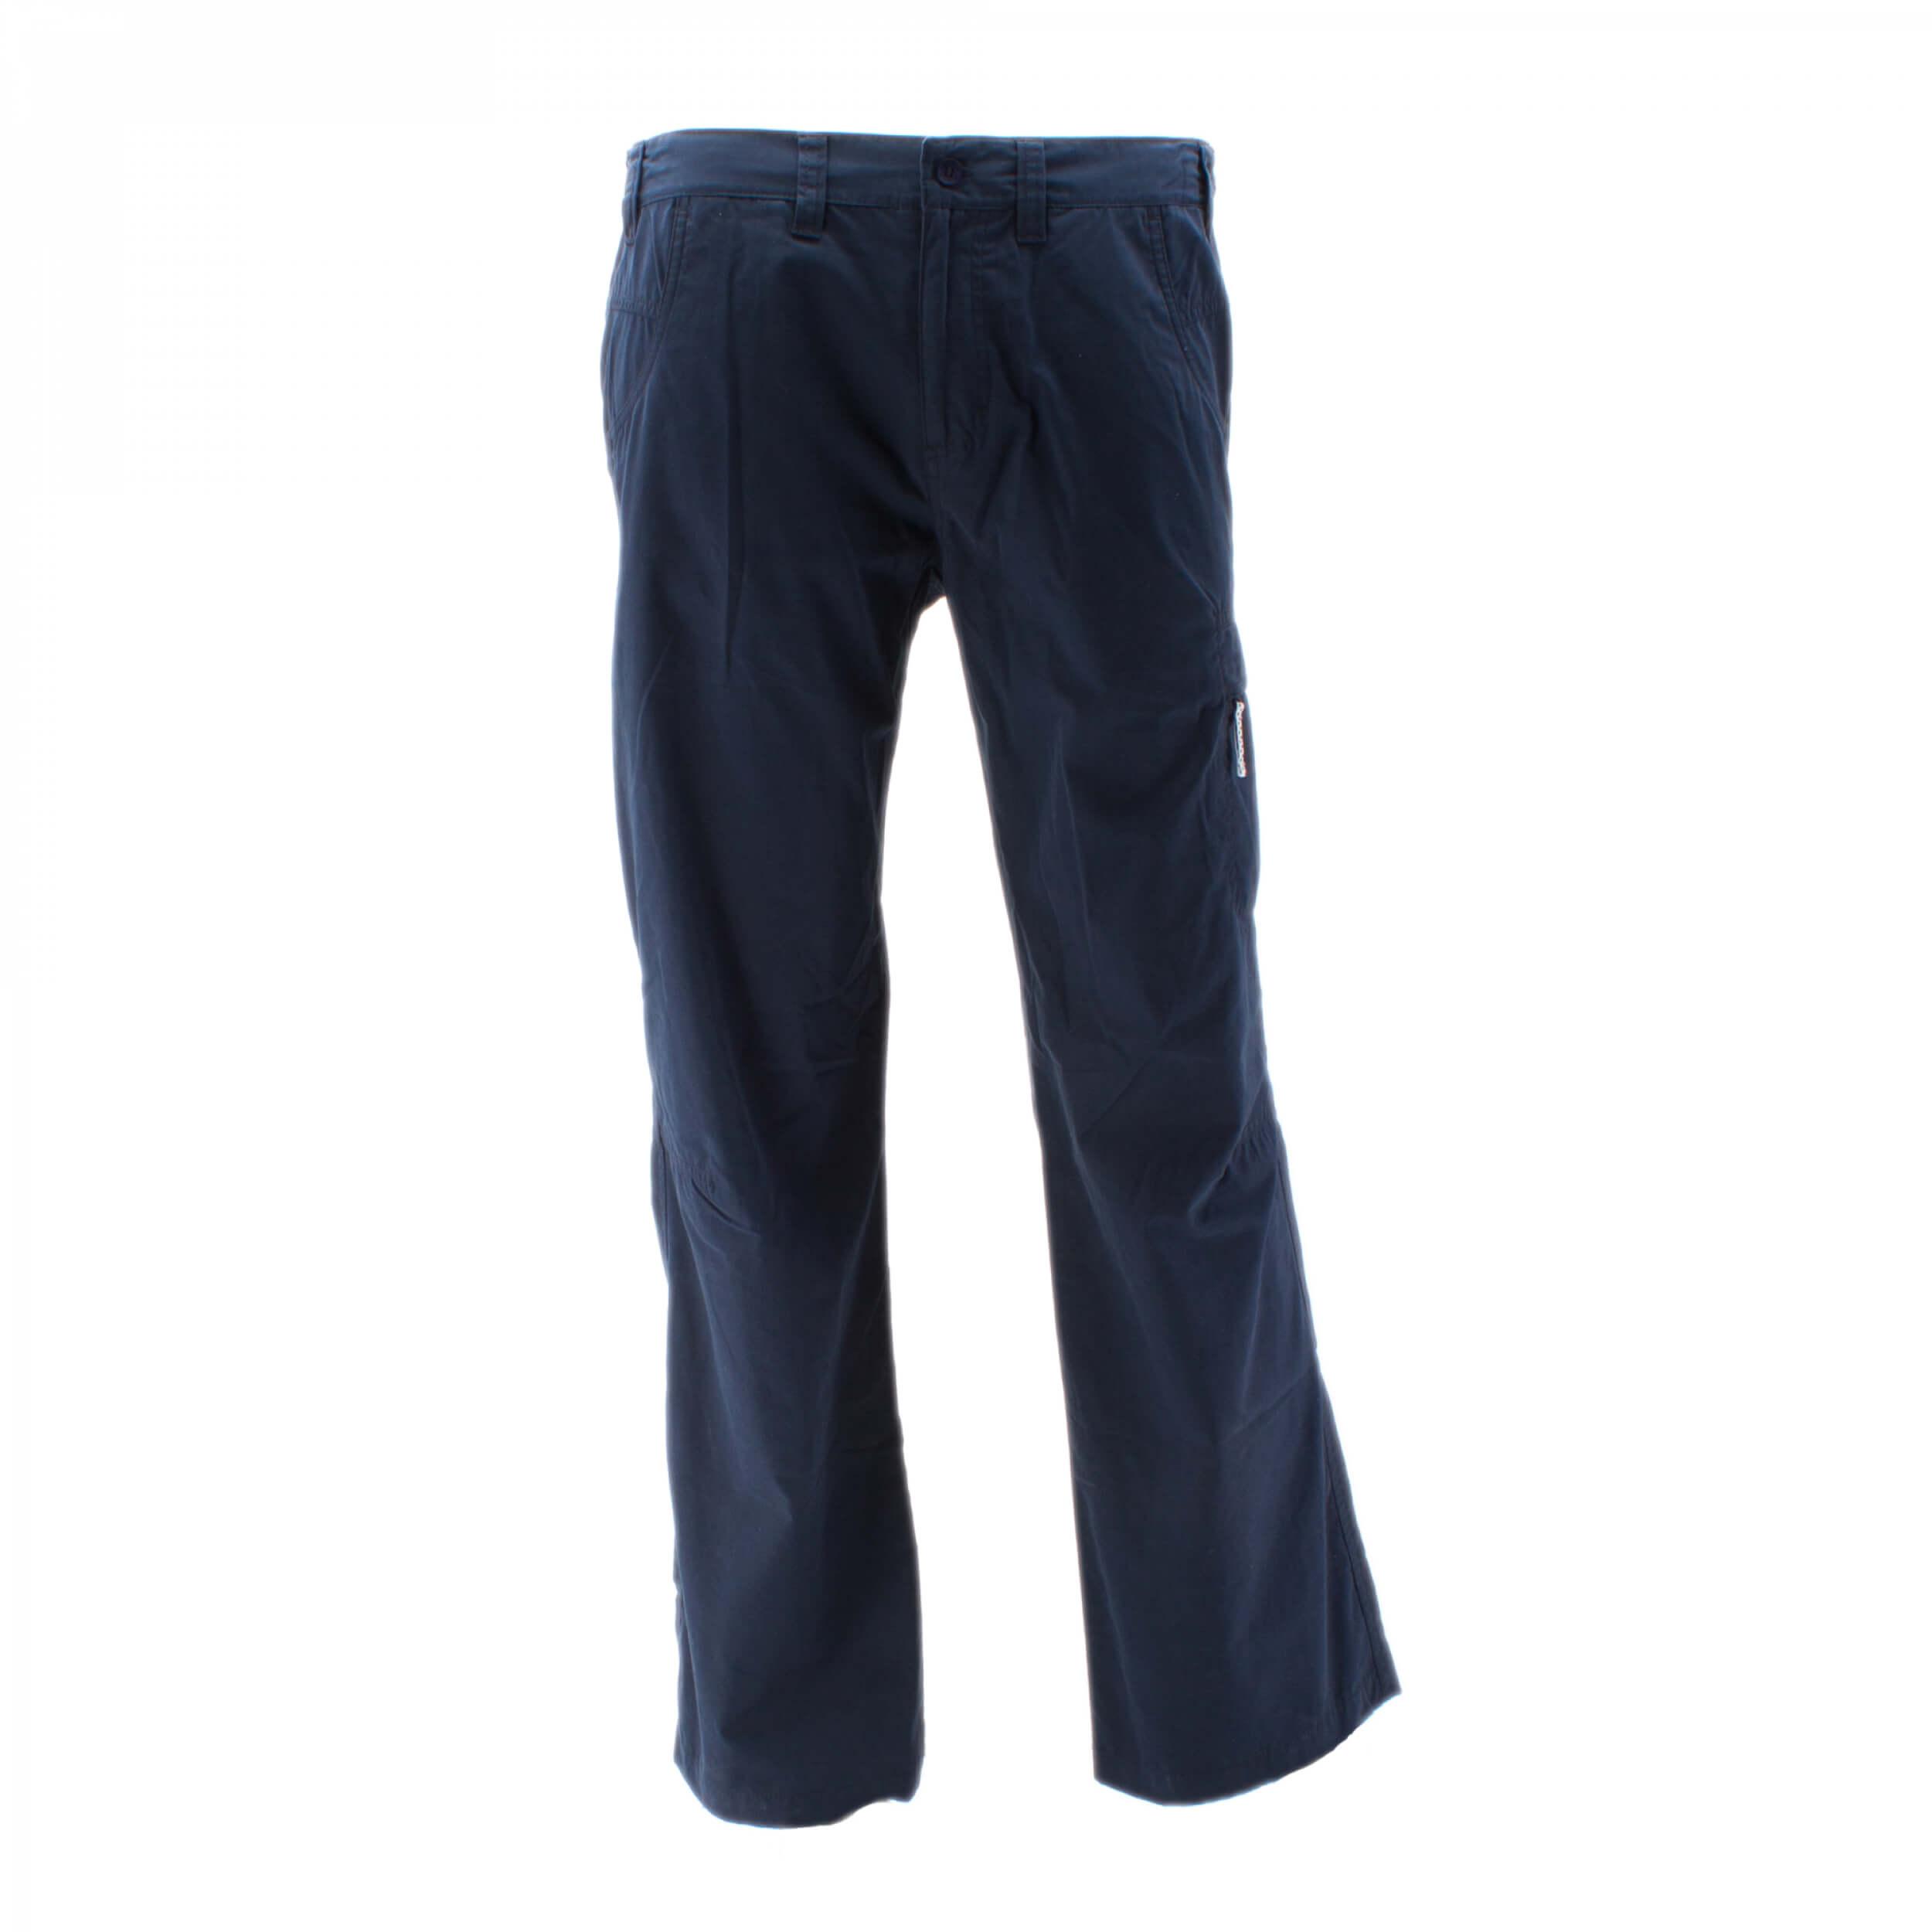 berghaus Women's Navigator Cargo Pant dark blue/blau